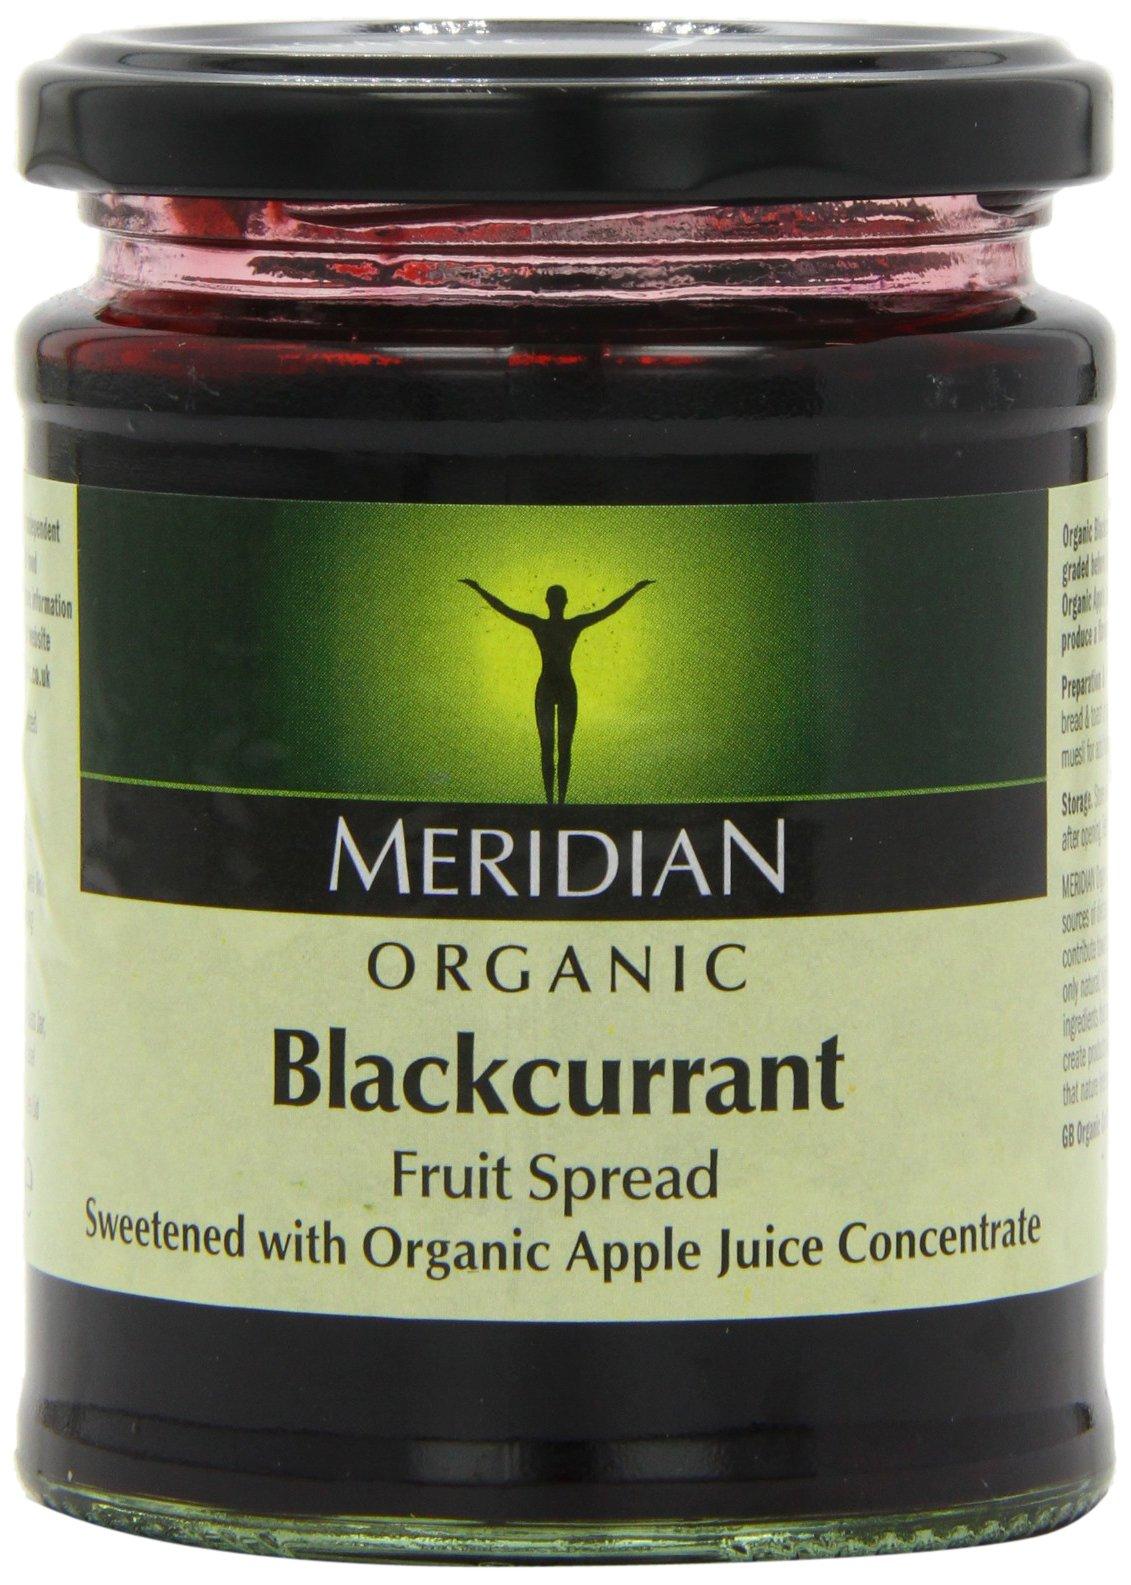 Meridian Organic Blackcurrant Fruit Spread 284 g (Pack of 6) by Meridian